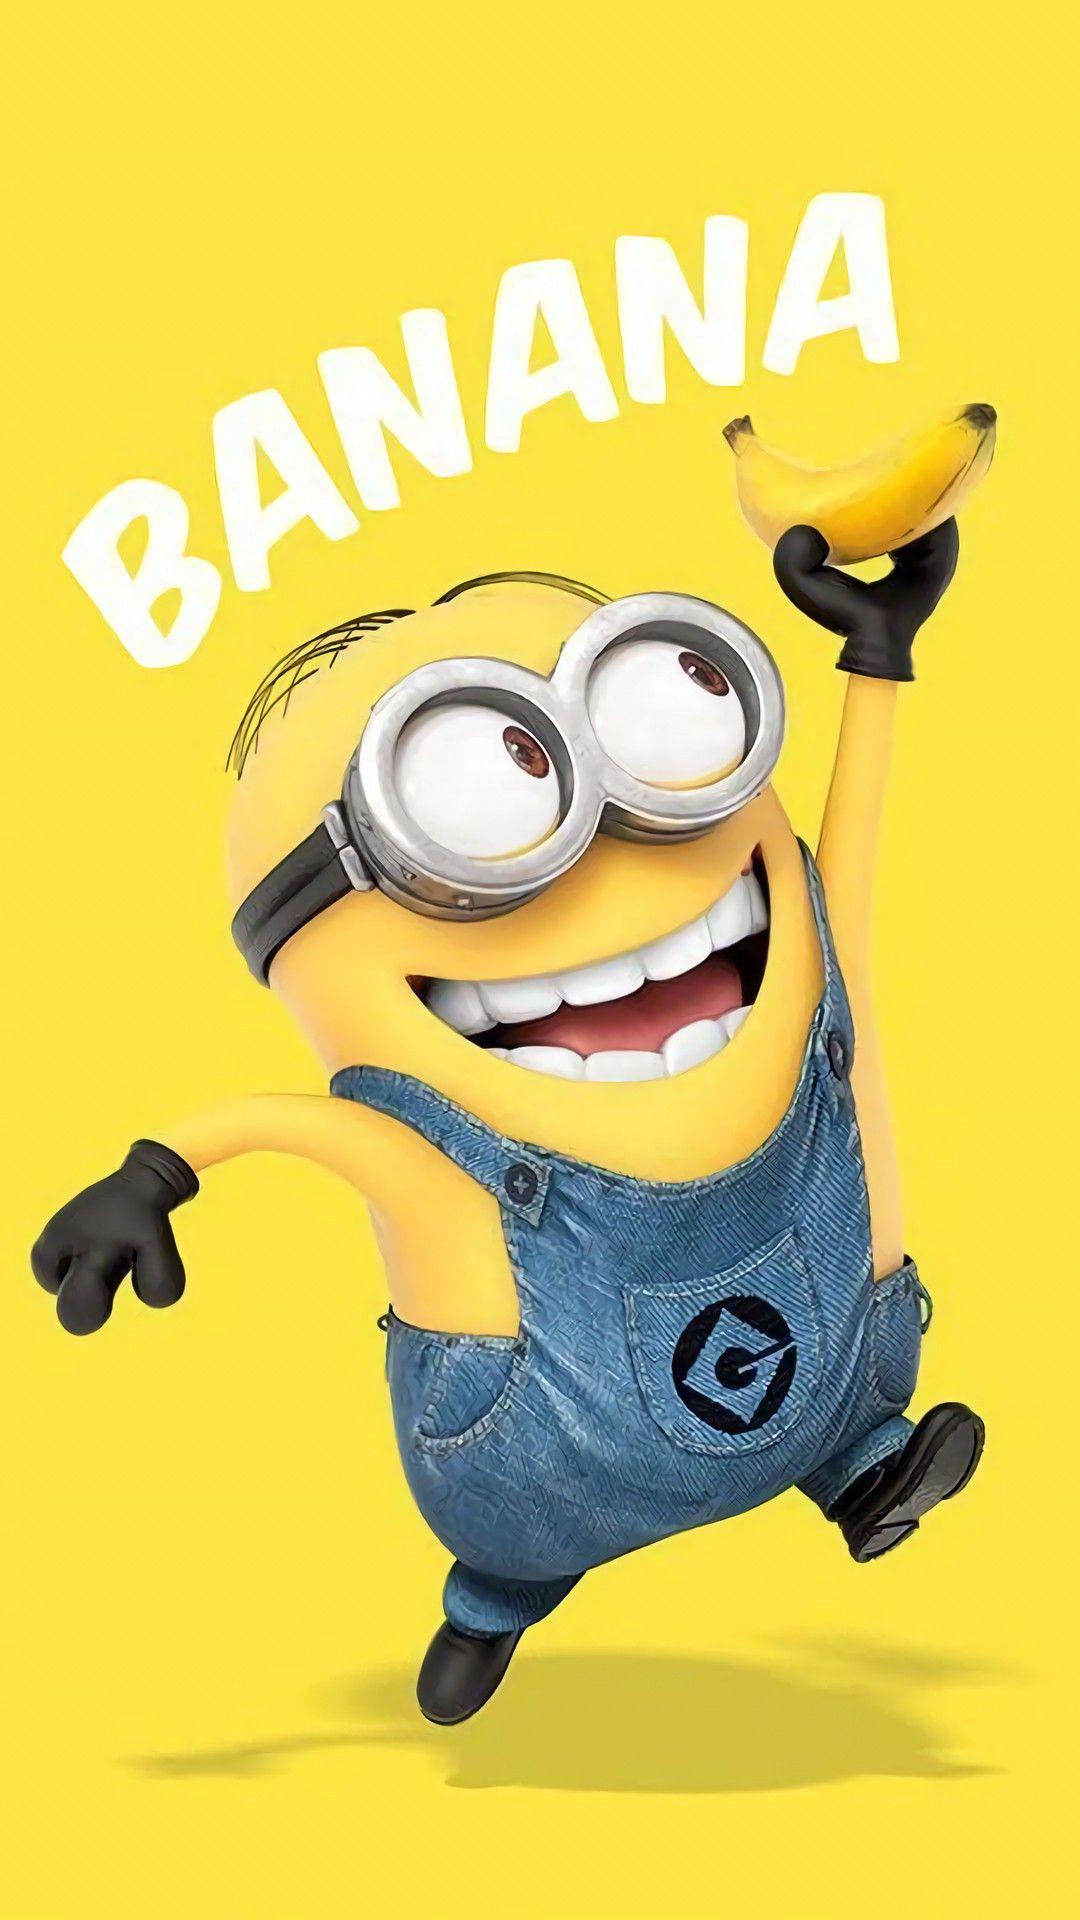 Pin By Audrey Martin On Minions Minions Wallpaper Minion Banana Minions Funny